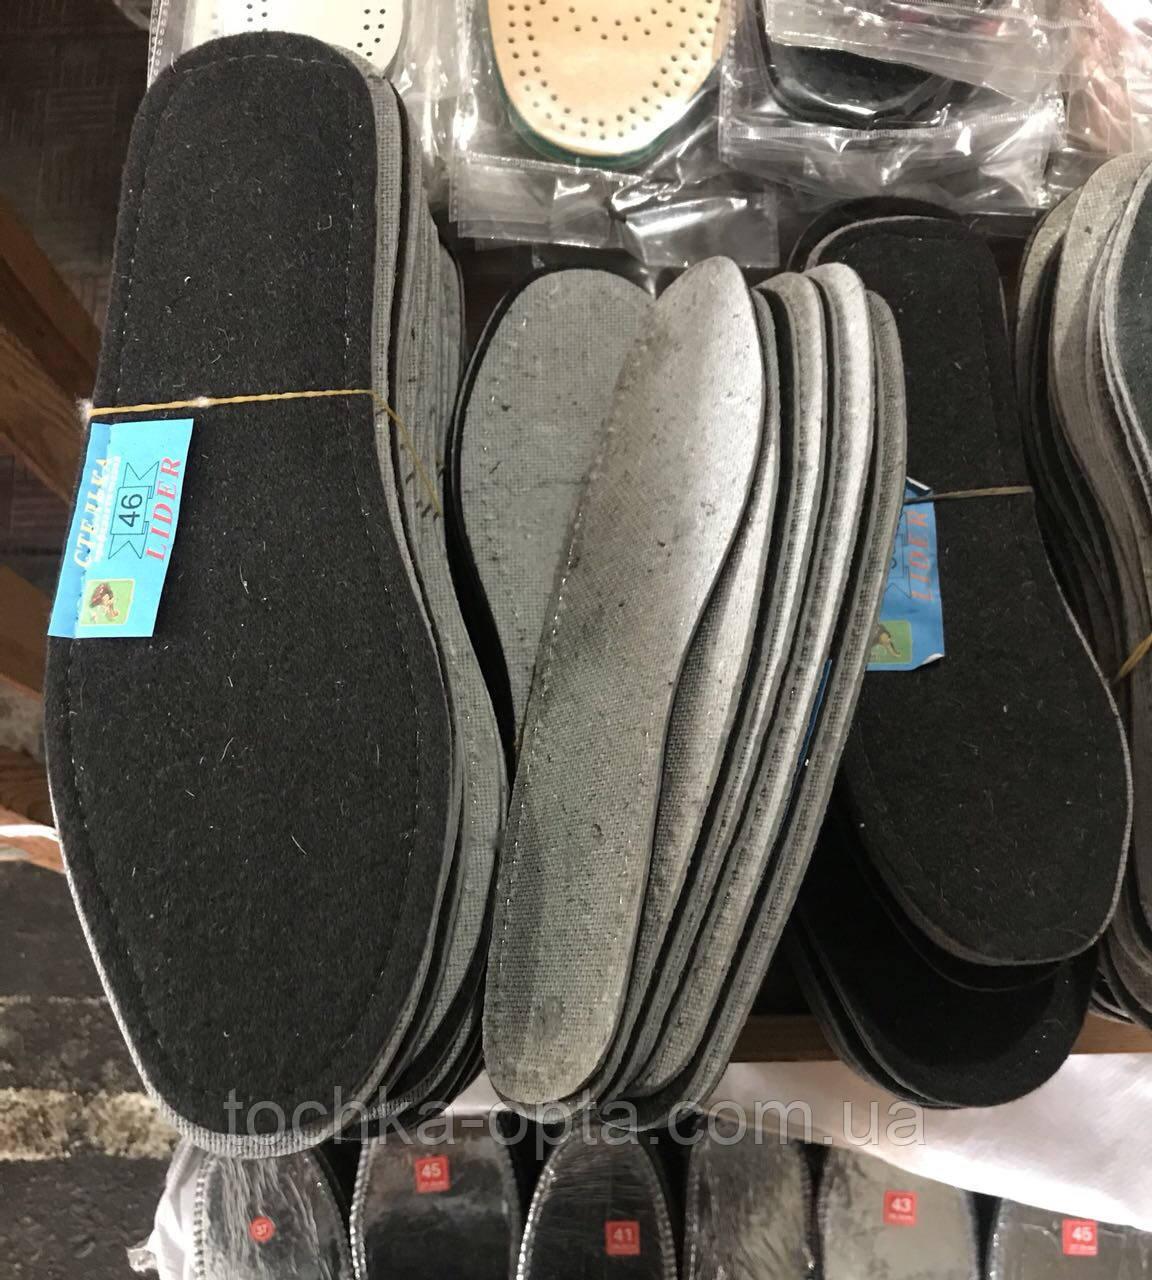 Стелька для обуви байка на кожкартоне 42